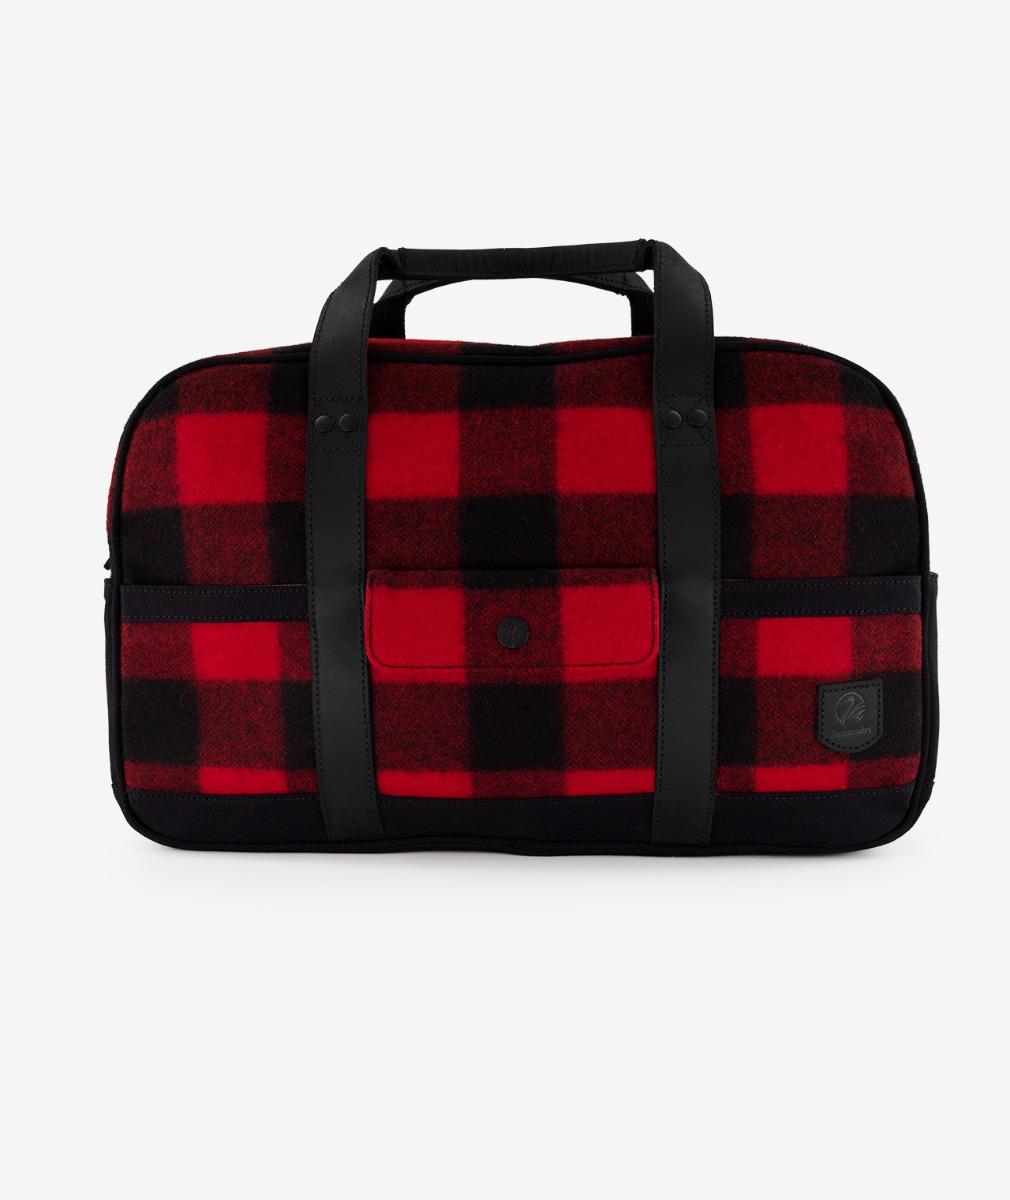 Swanndri Kingston Overnighter Bag in Red/Black Check